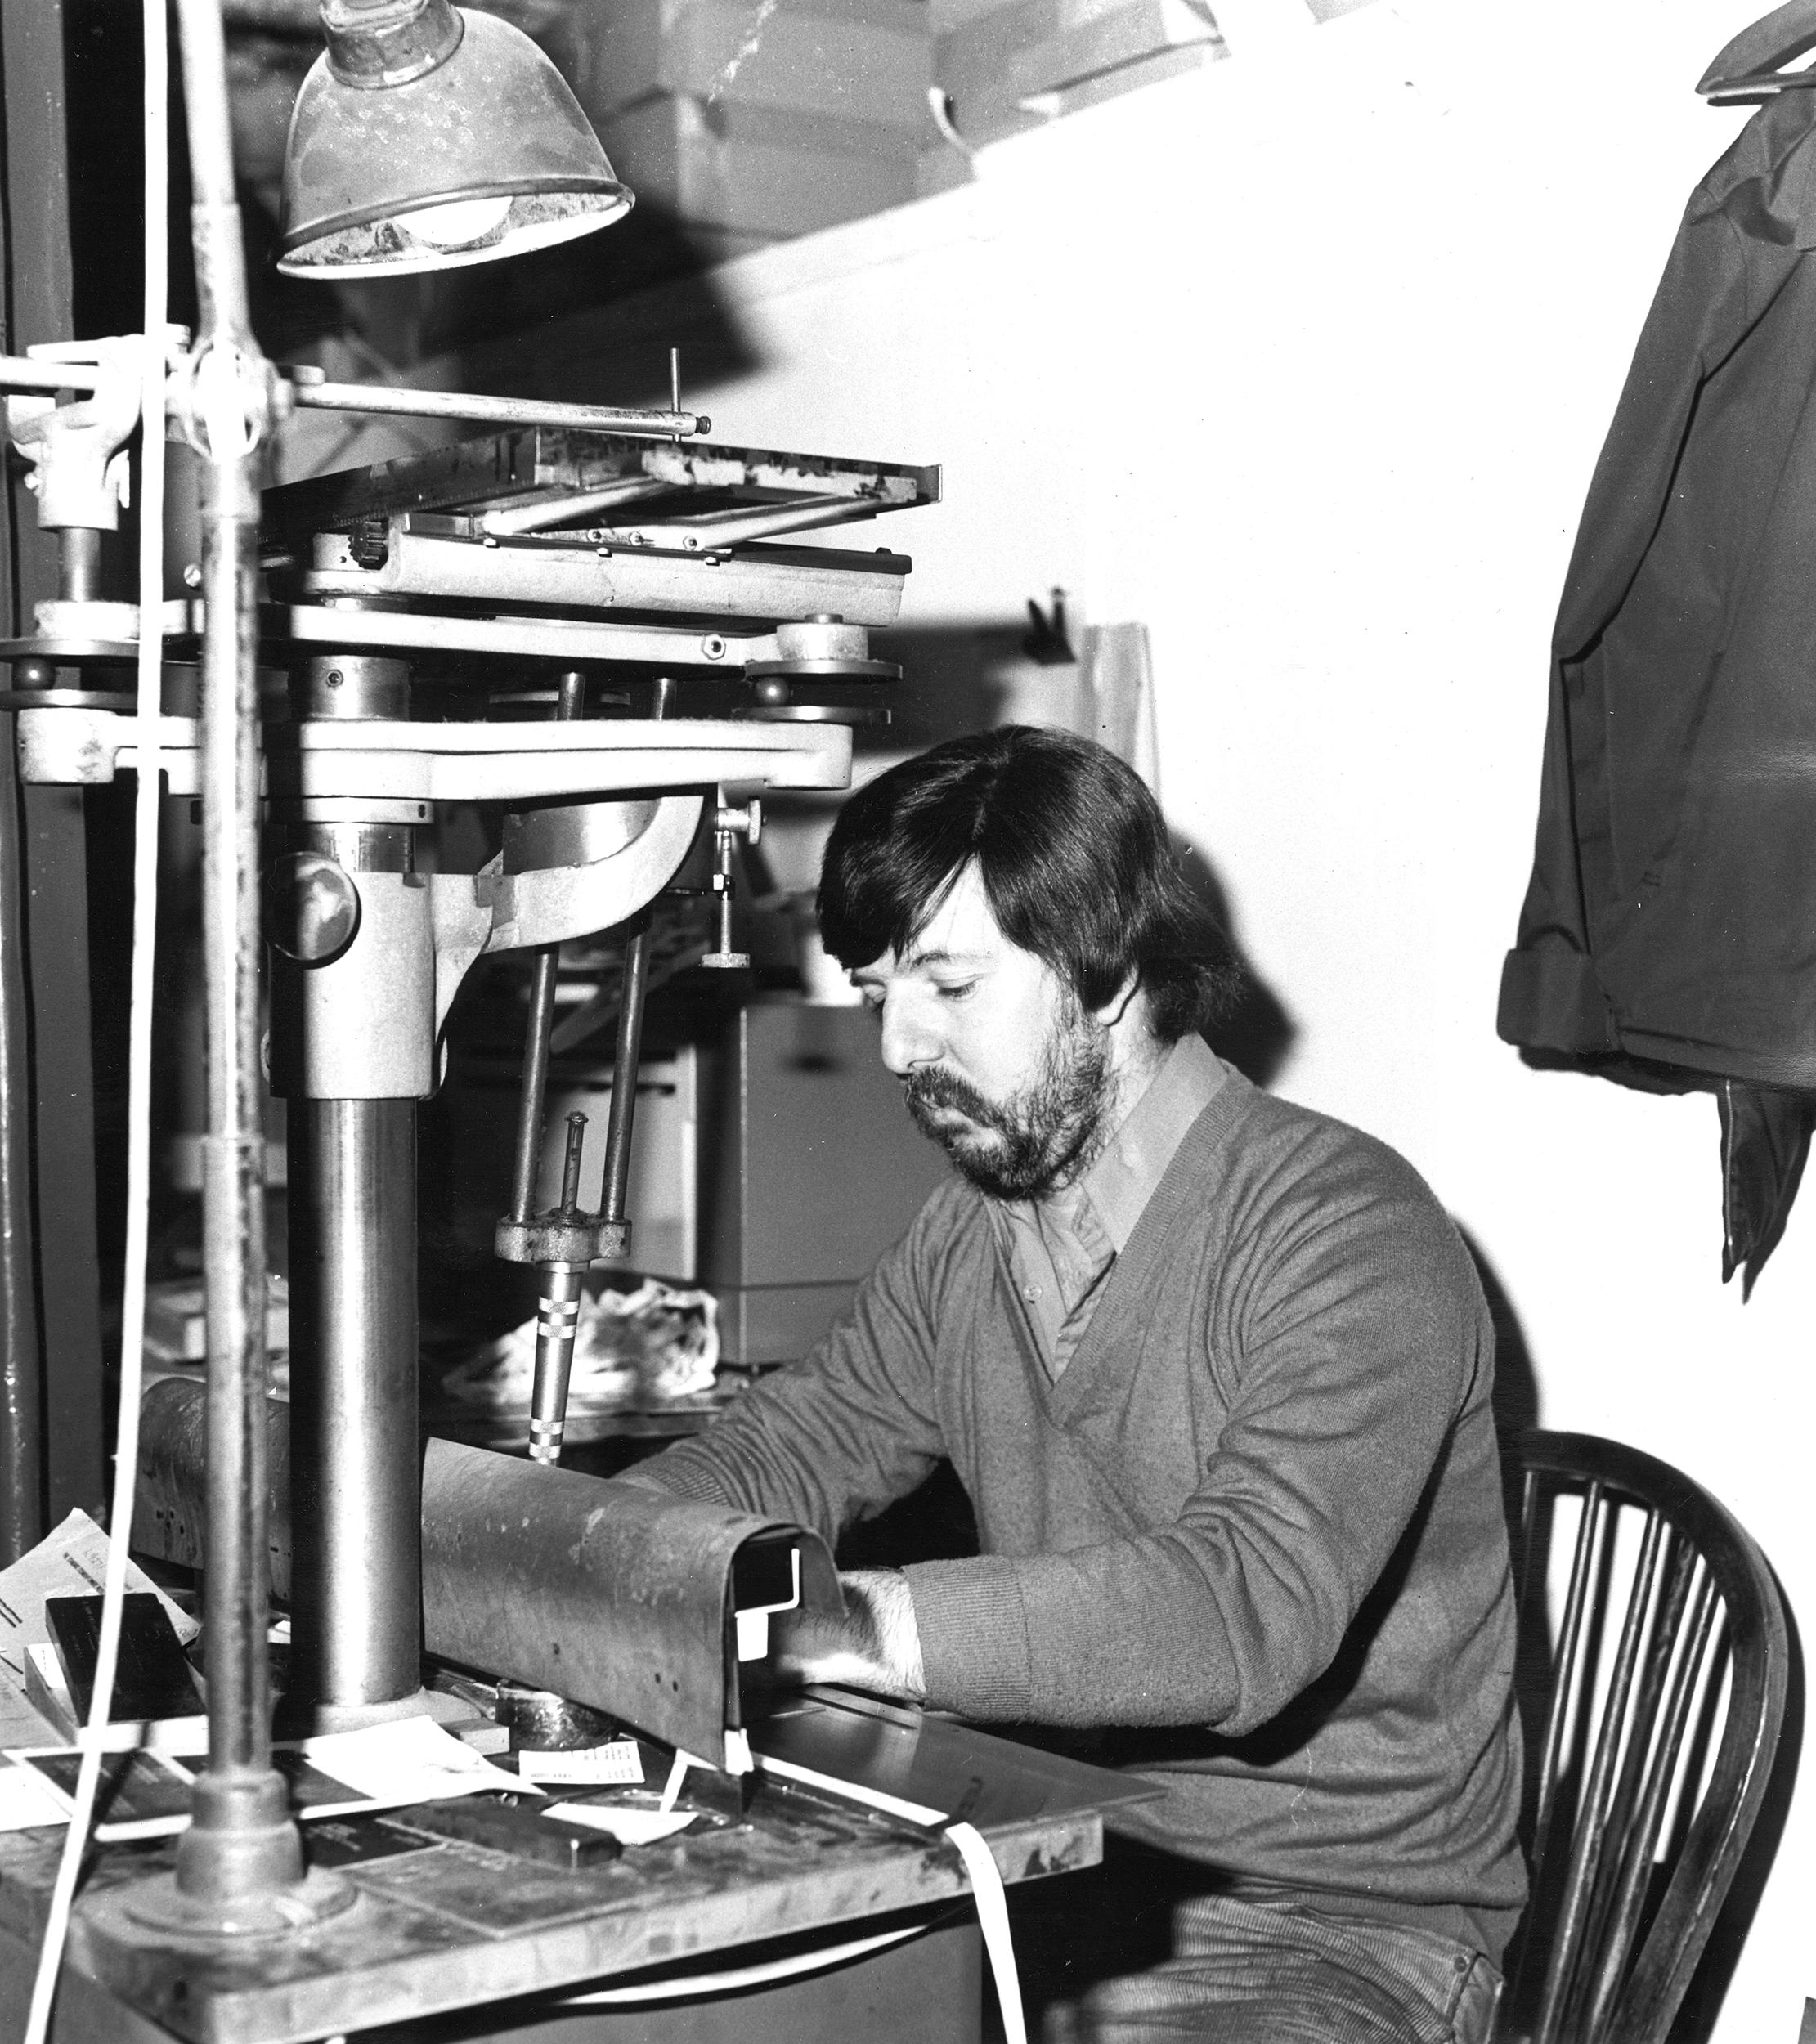 Man sitting at desk using machinery